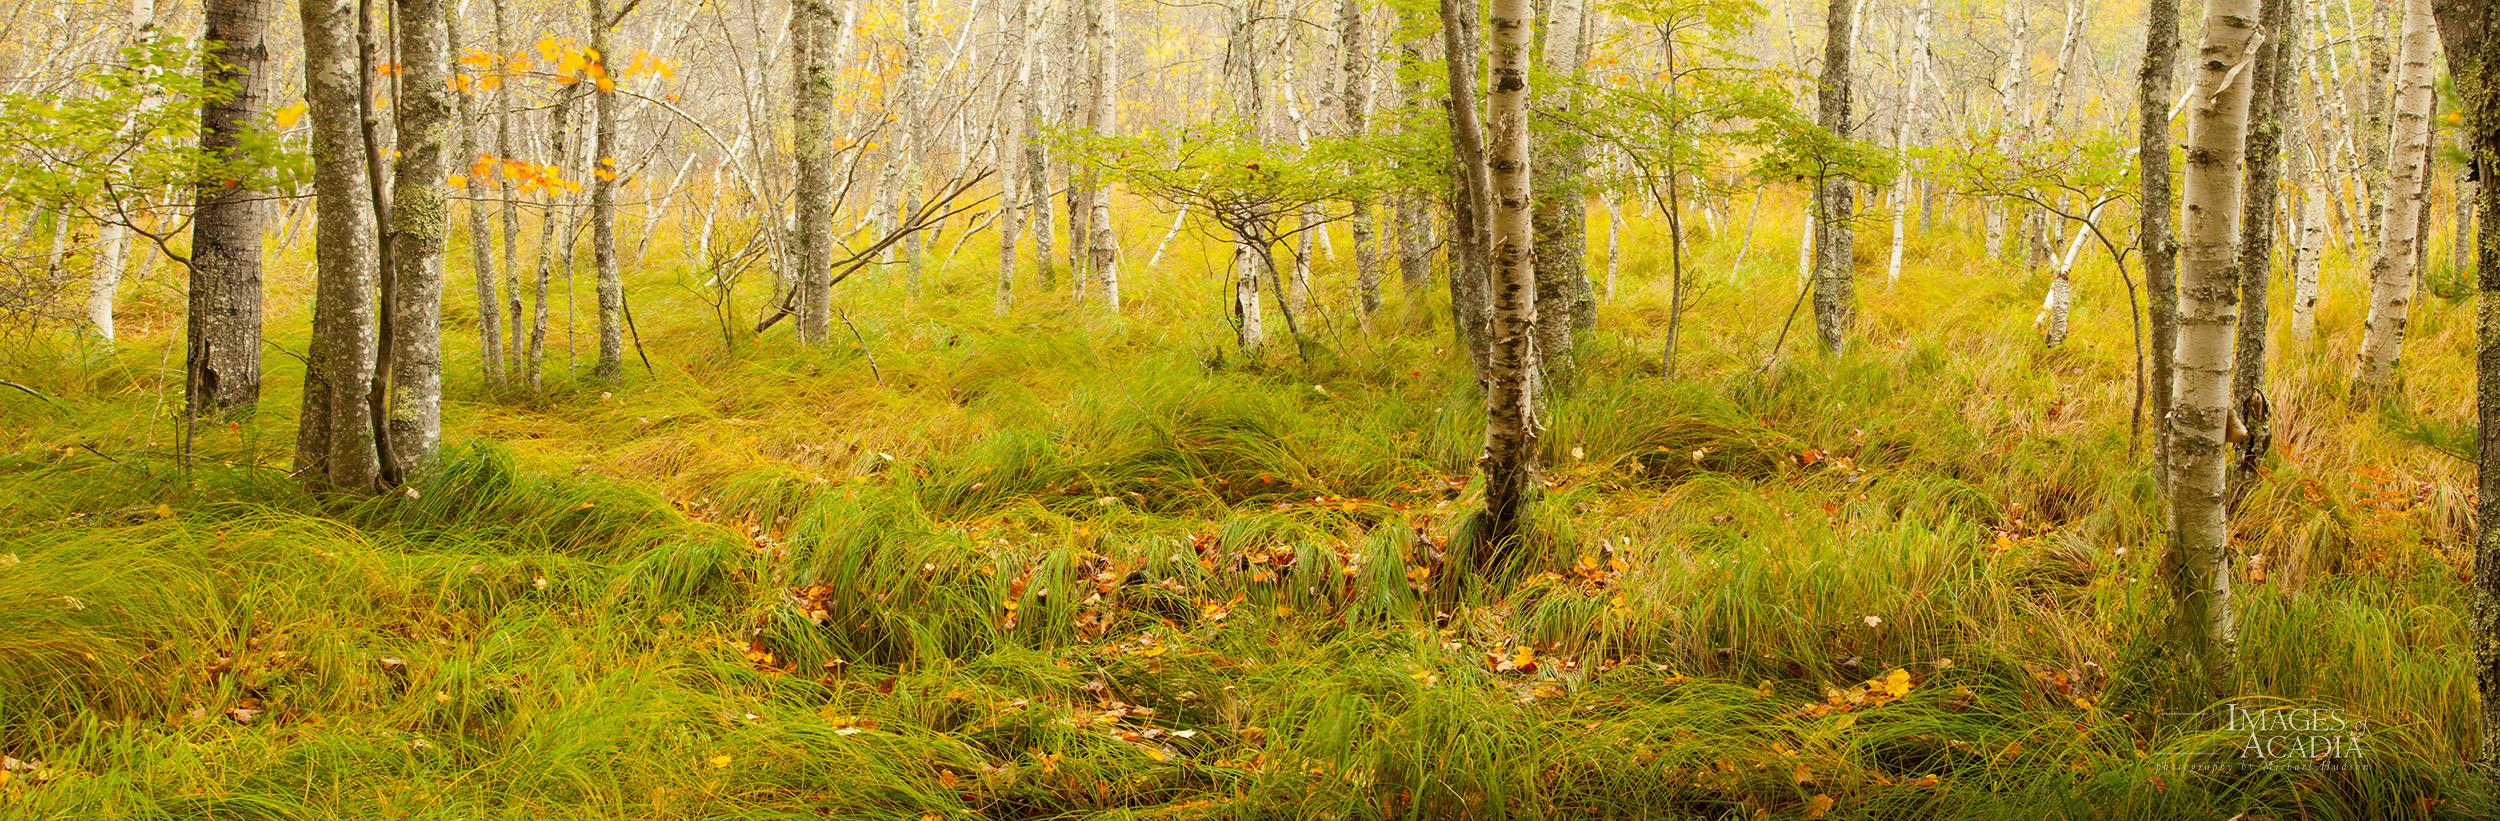 Birch woods at Sieur de Monts